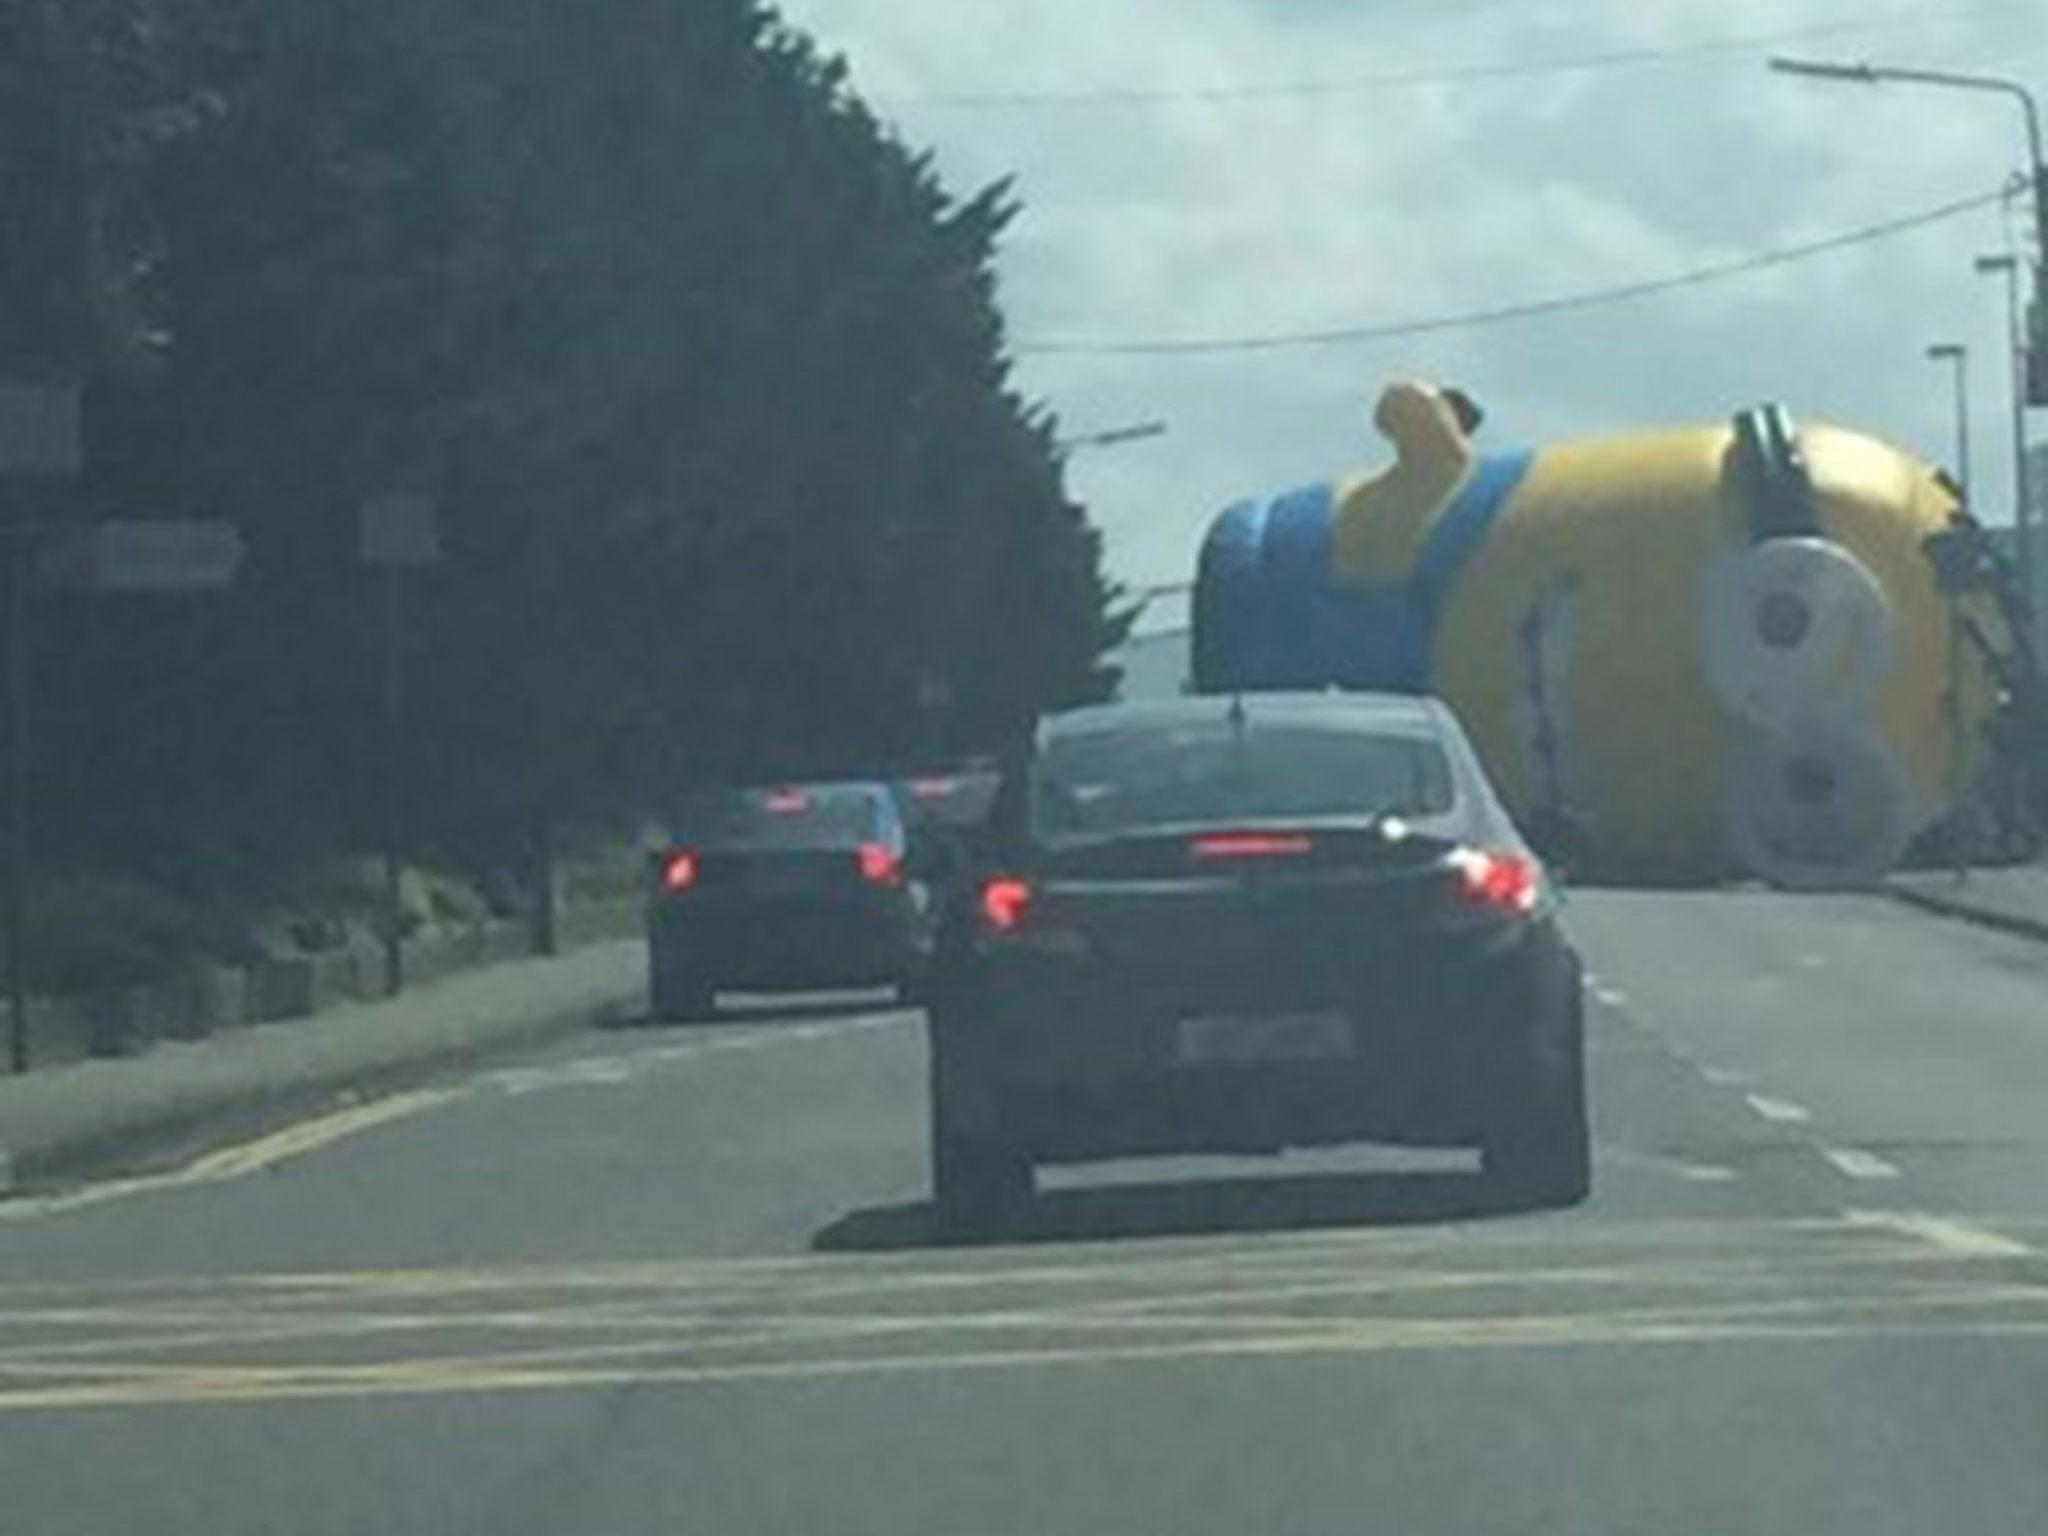 c02fa10ee8 Giant Minion terrorises drivers in Ireland as 40ft inflatable blocks  traffic on Dublin road